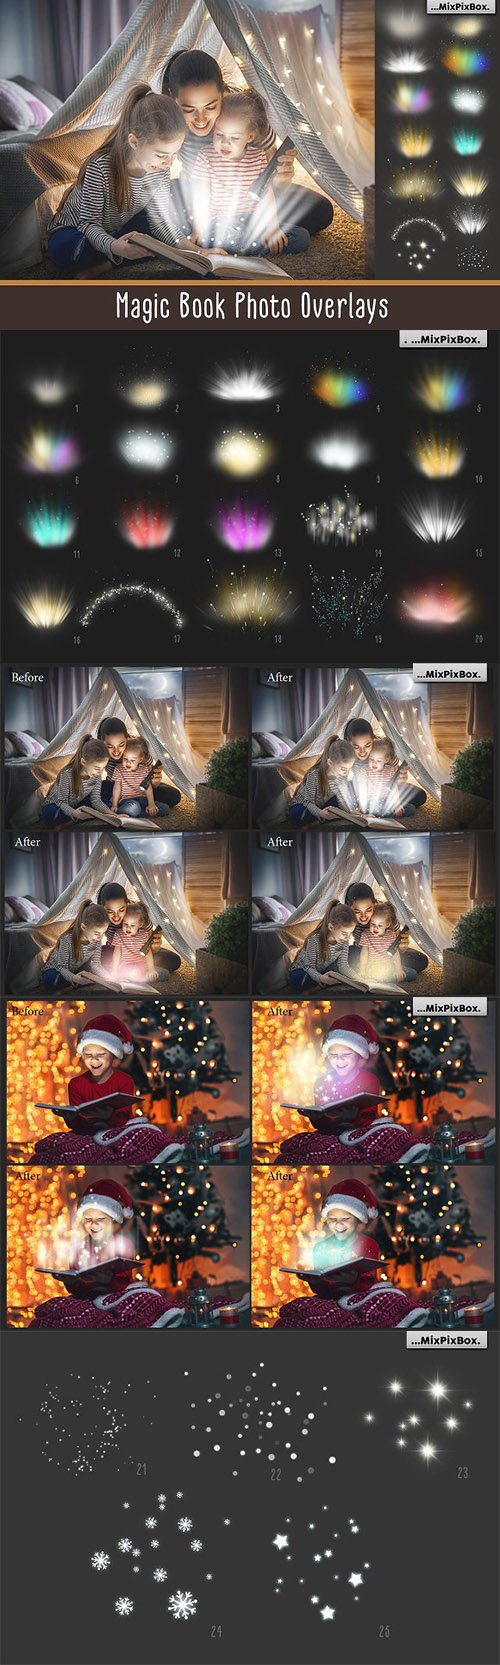 CreativeMarket - Magic Book Light Photo Overlays 3069587